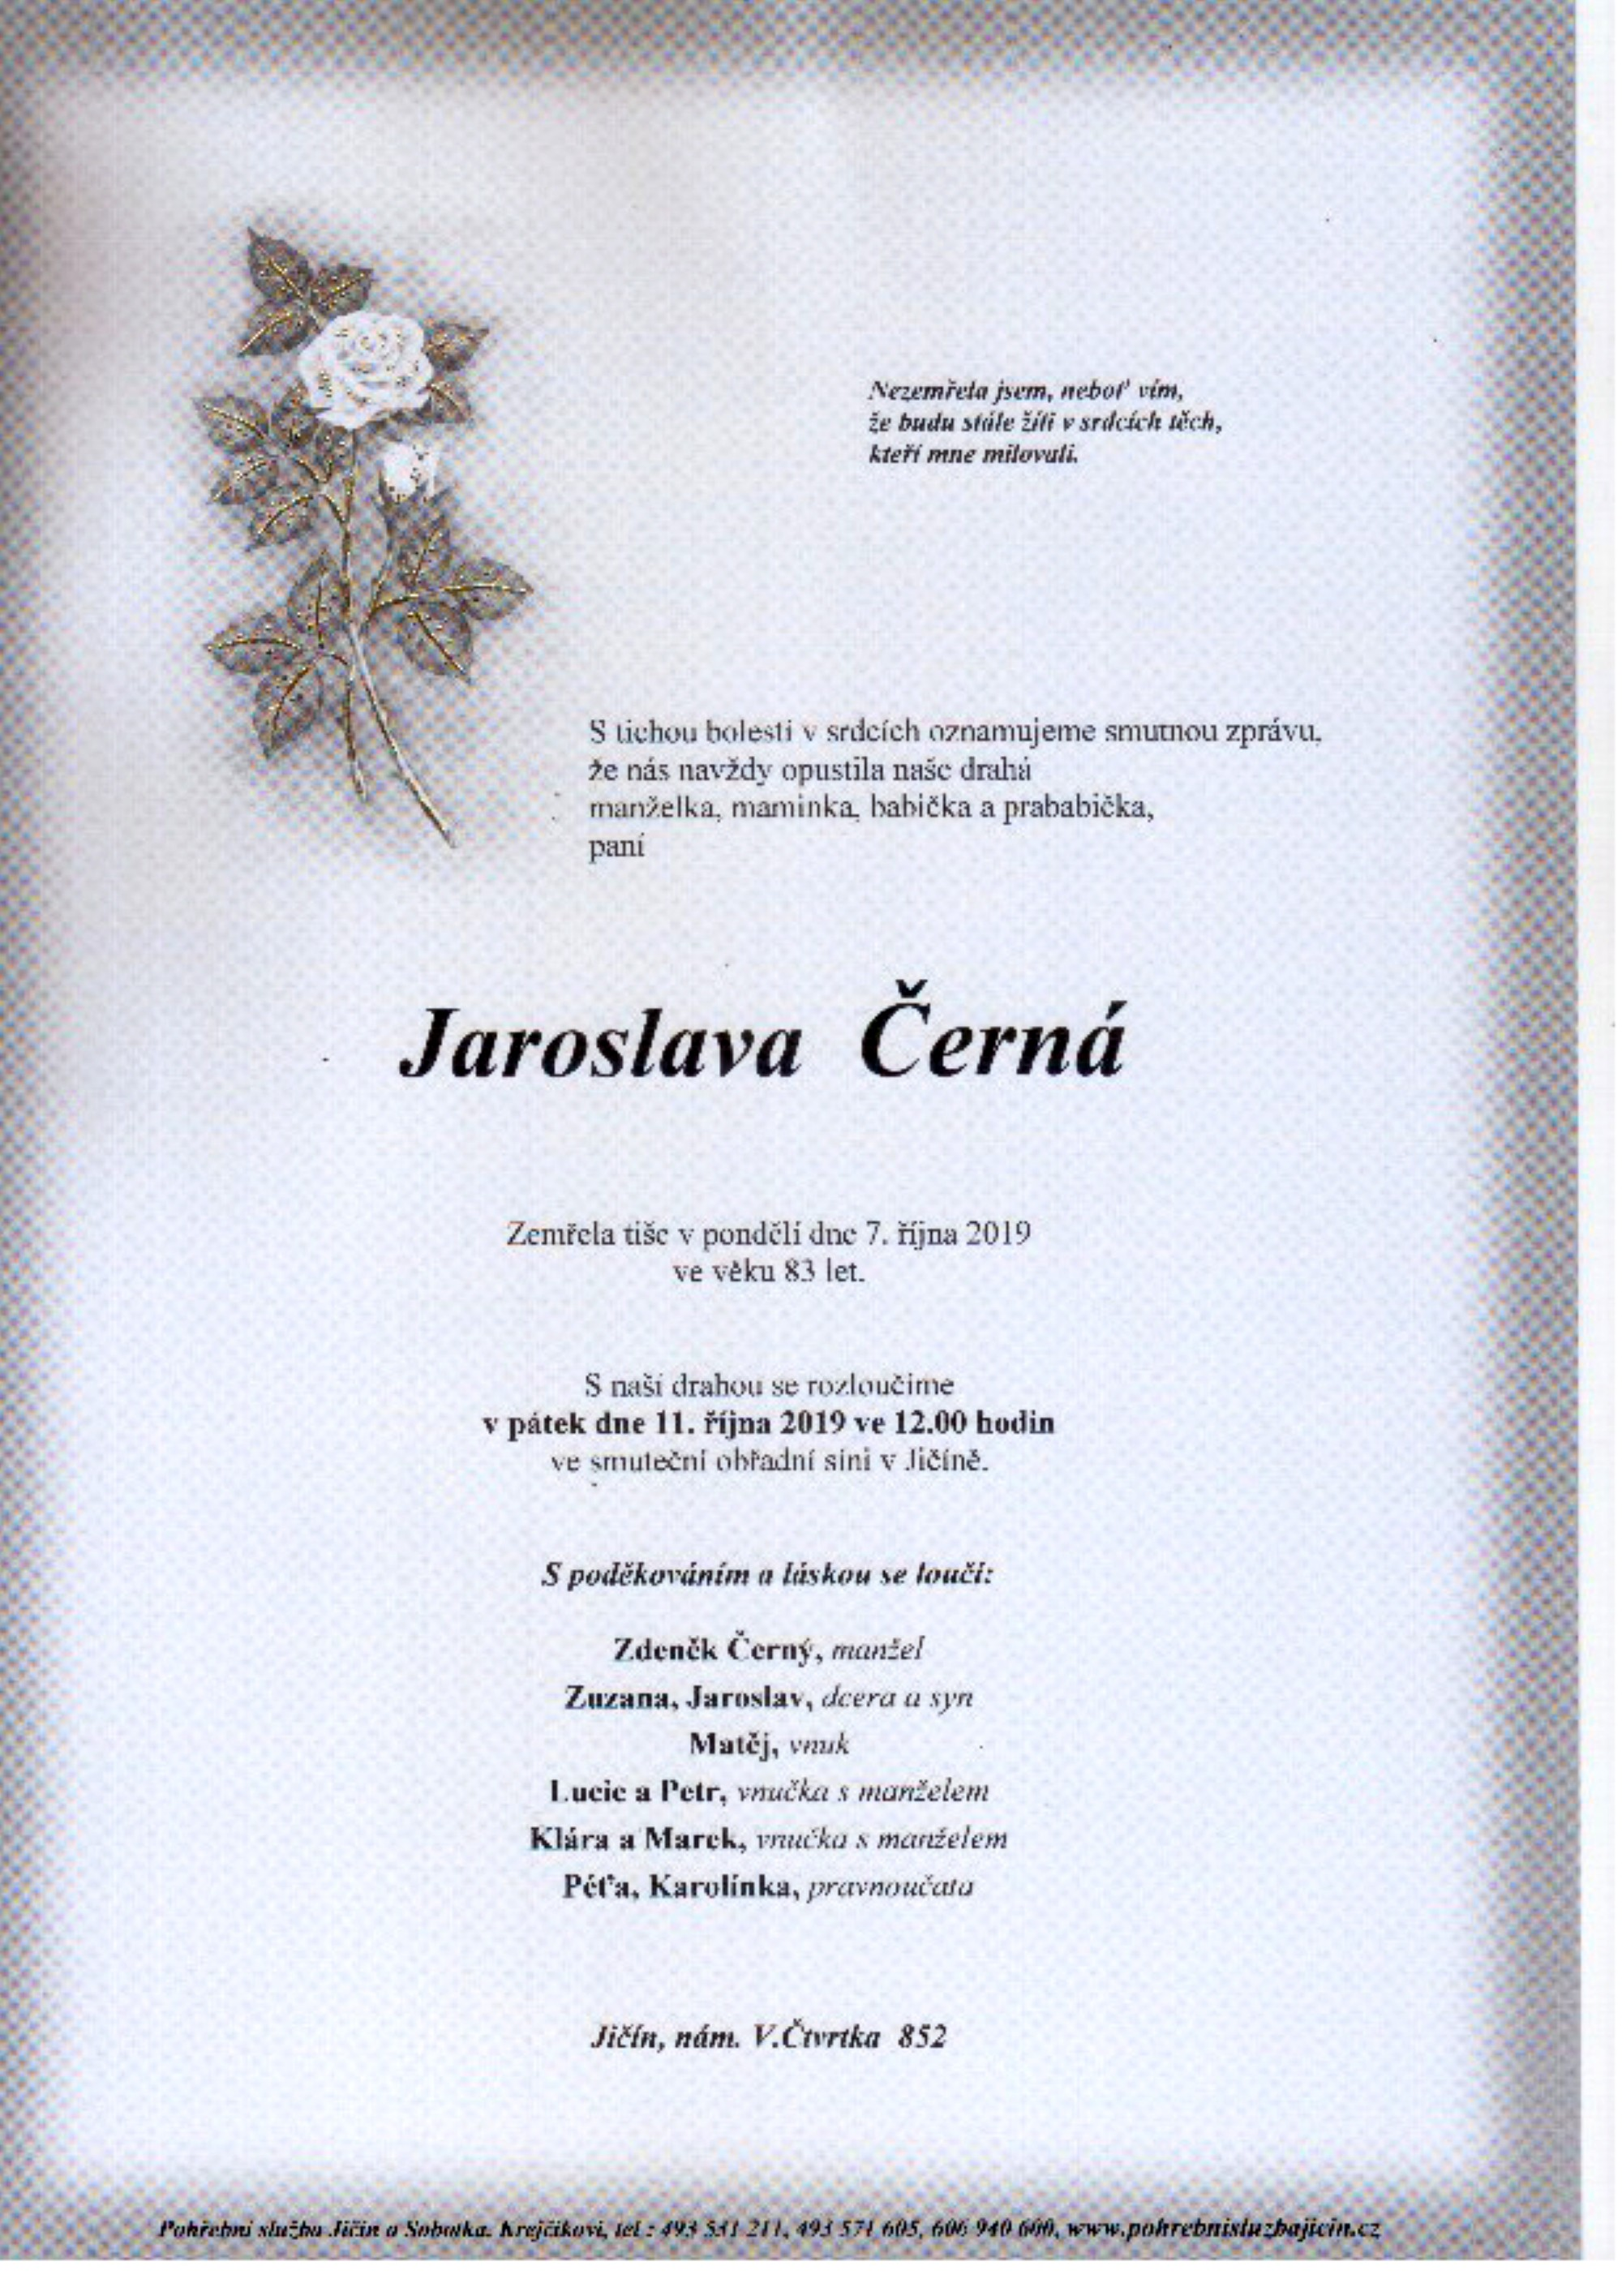 Jaroslava Černá